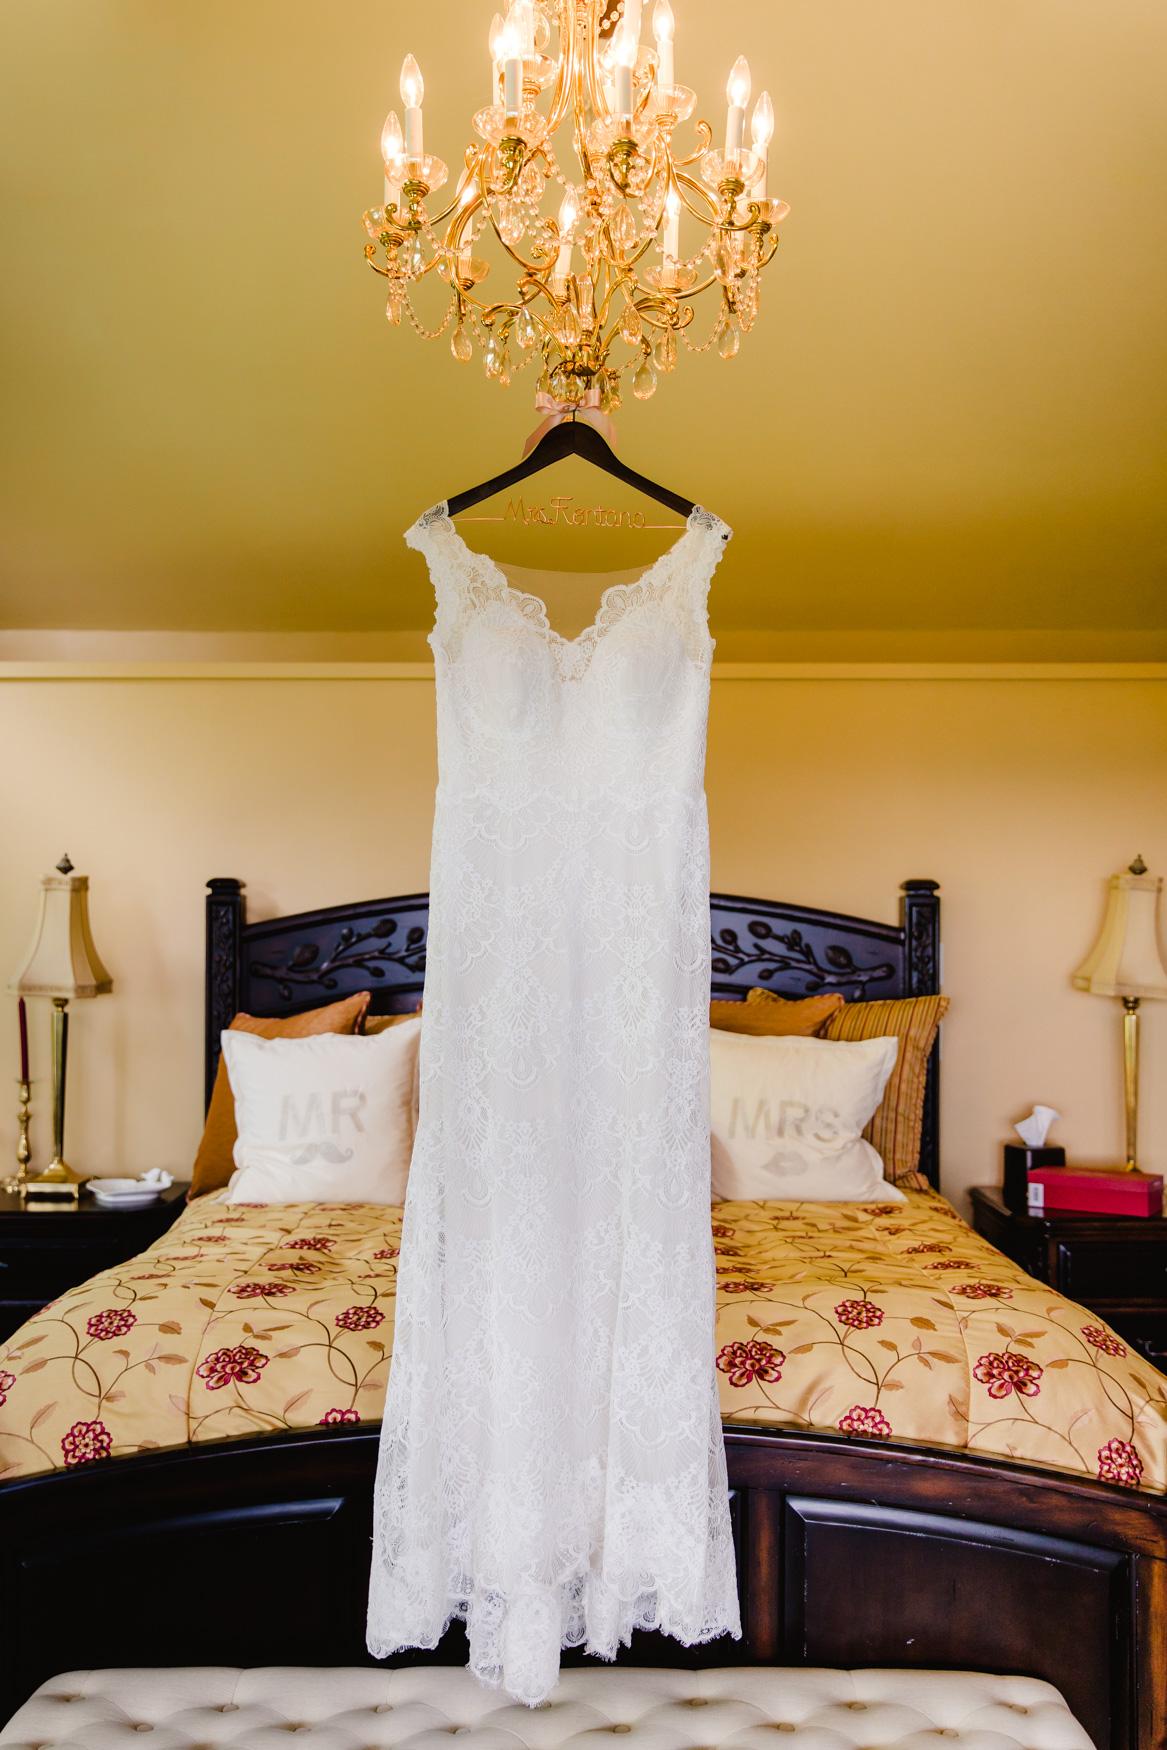 Wedding Dress Hanging From Chandelier Waynesville NC Wedding Photographers